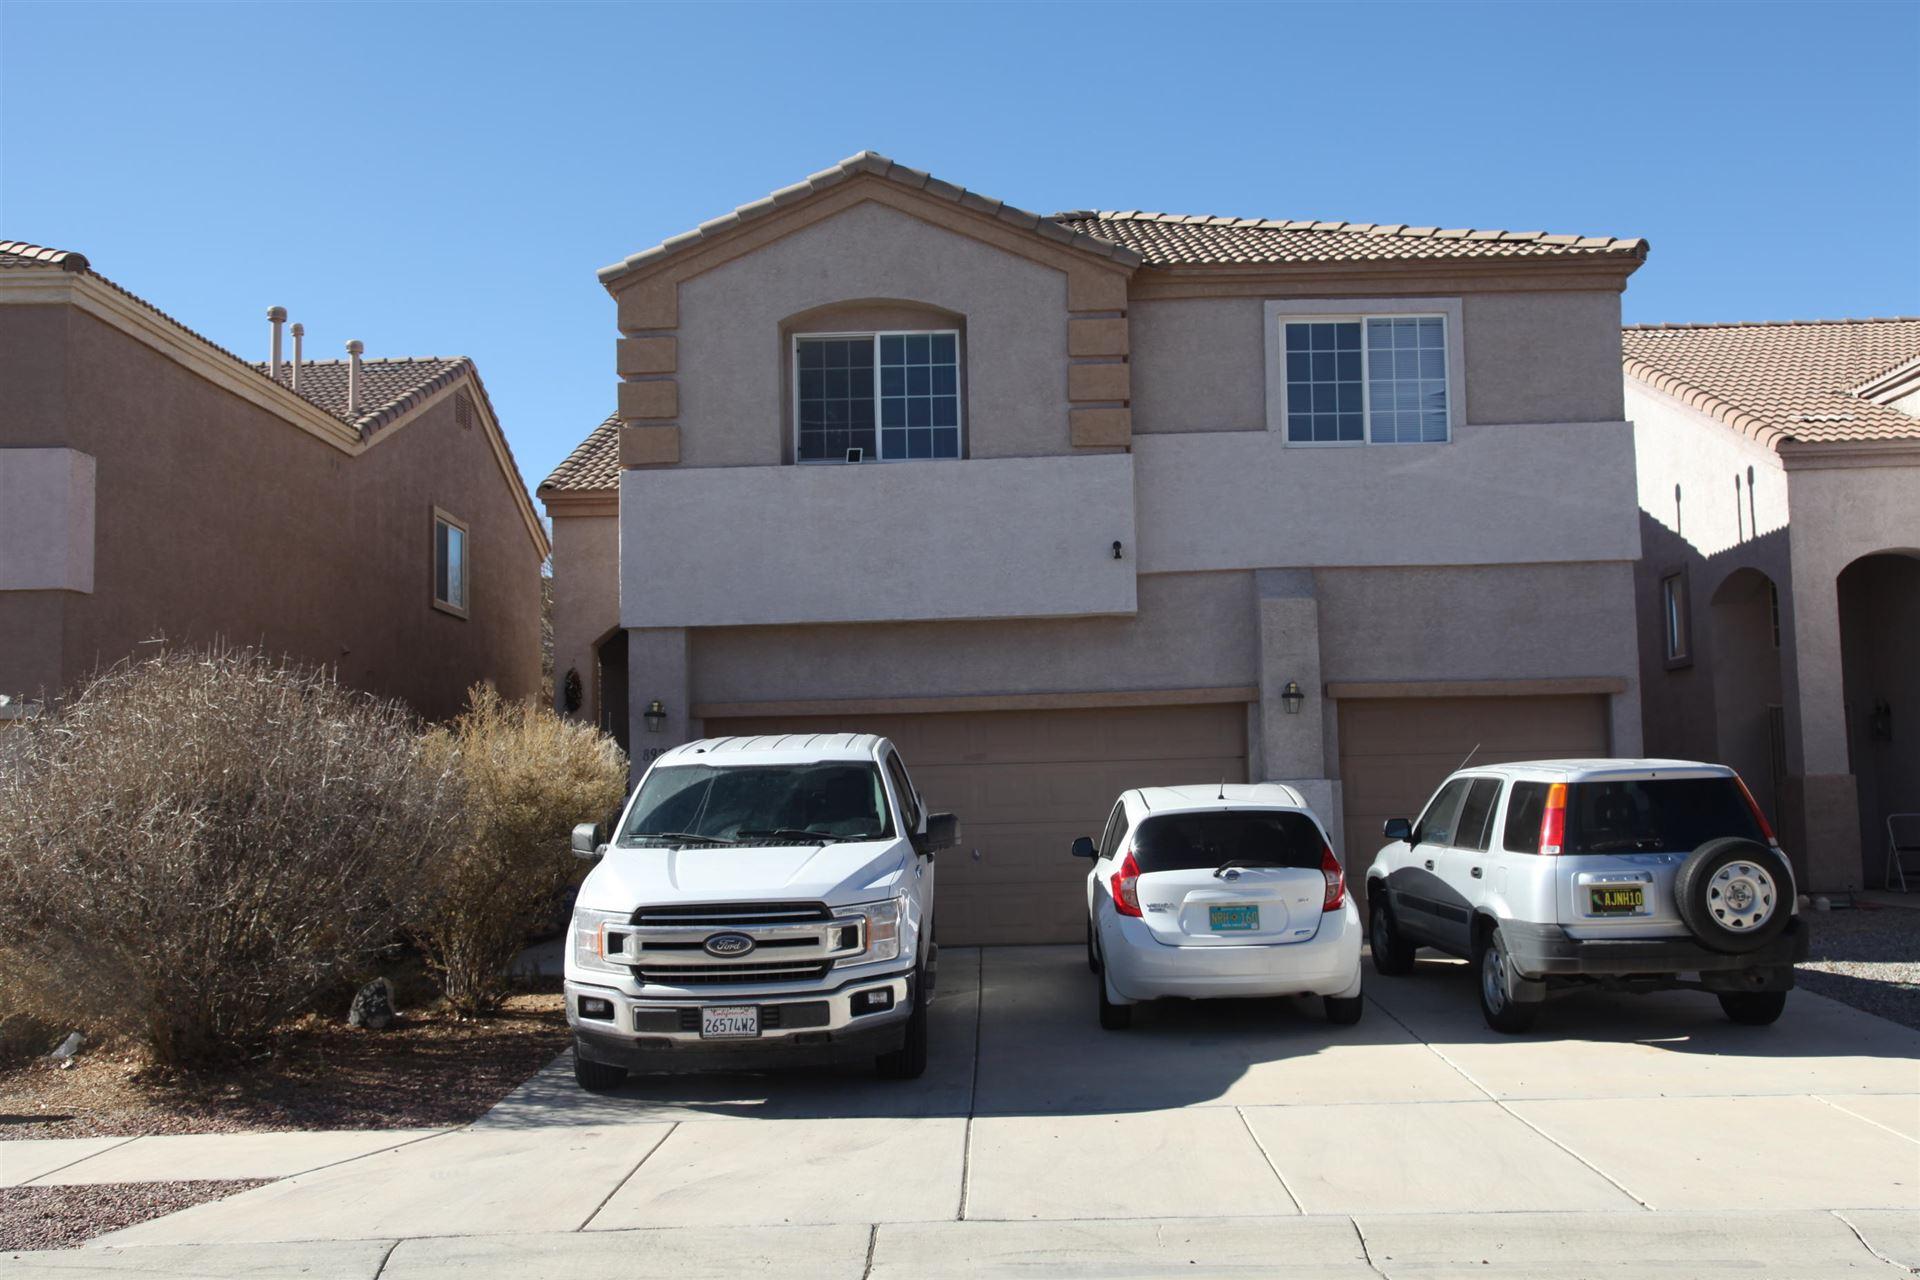 8923 BALSAM GLADE Road NW, Albuquerque, NM 87114 - MLS#: 983988